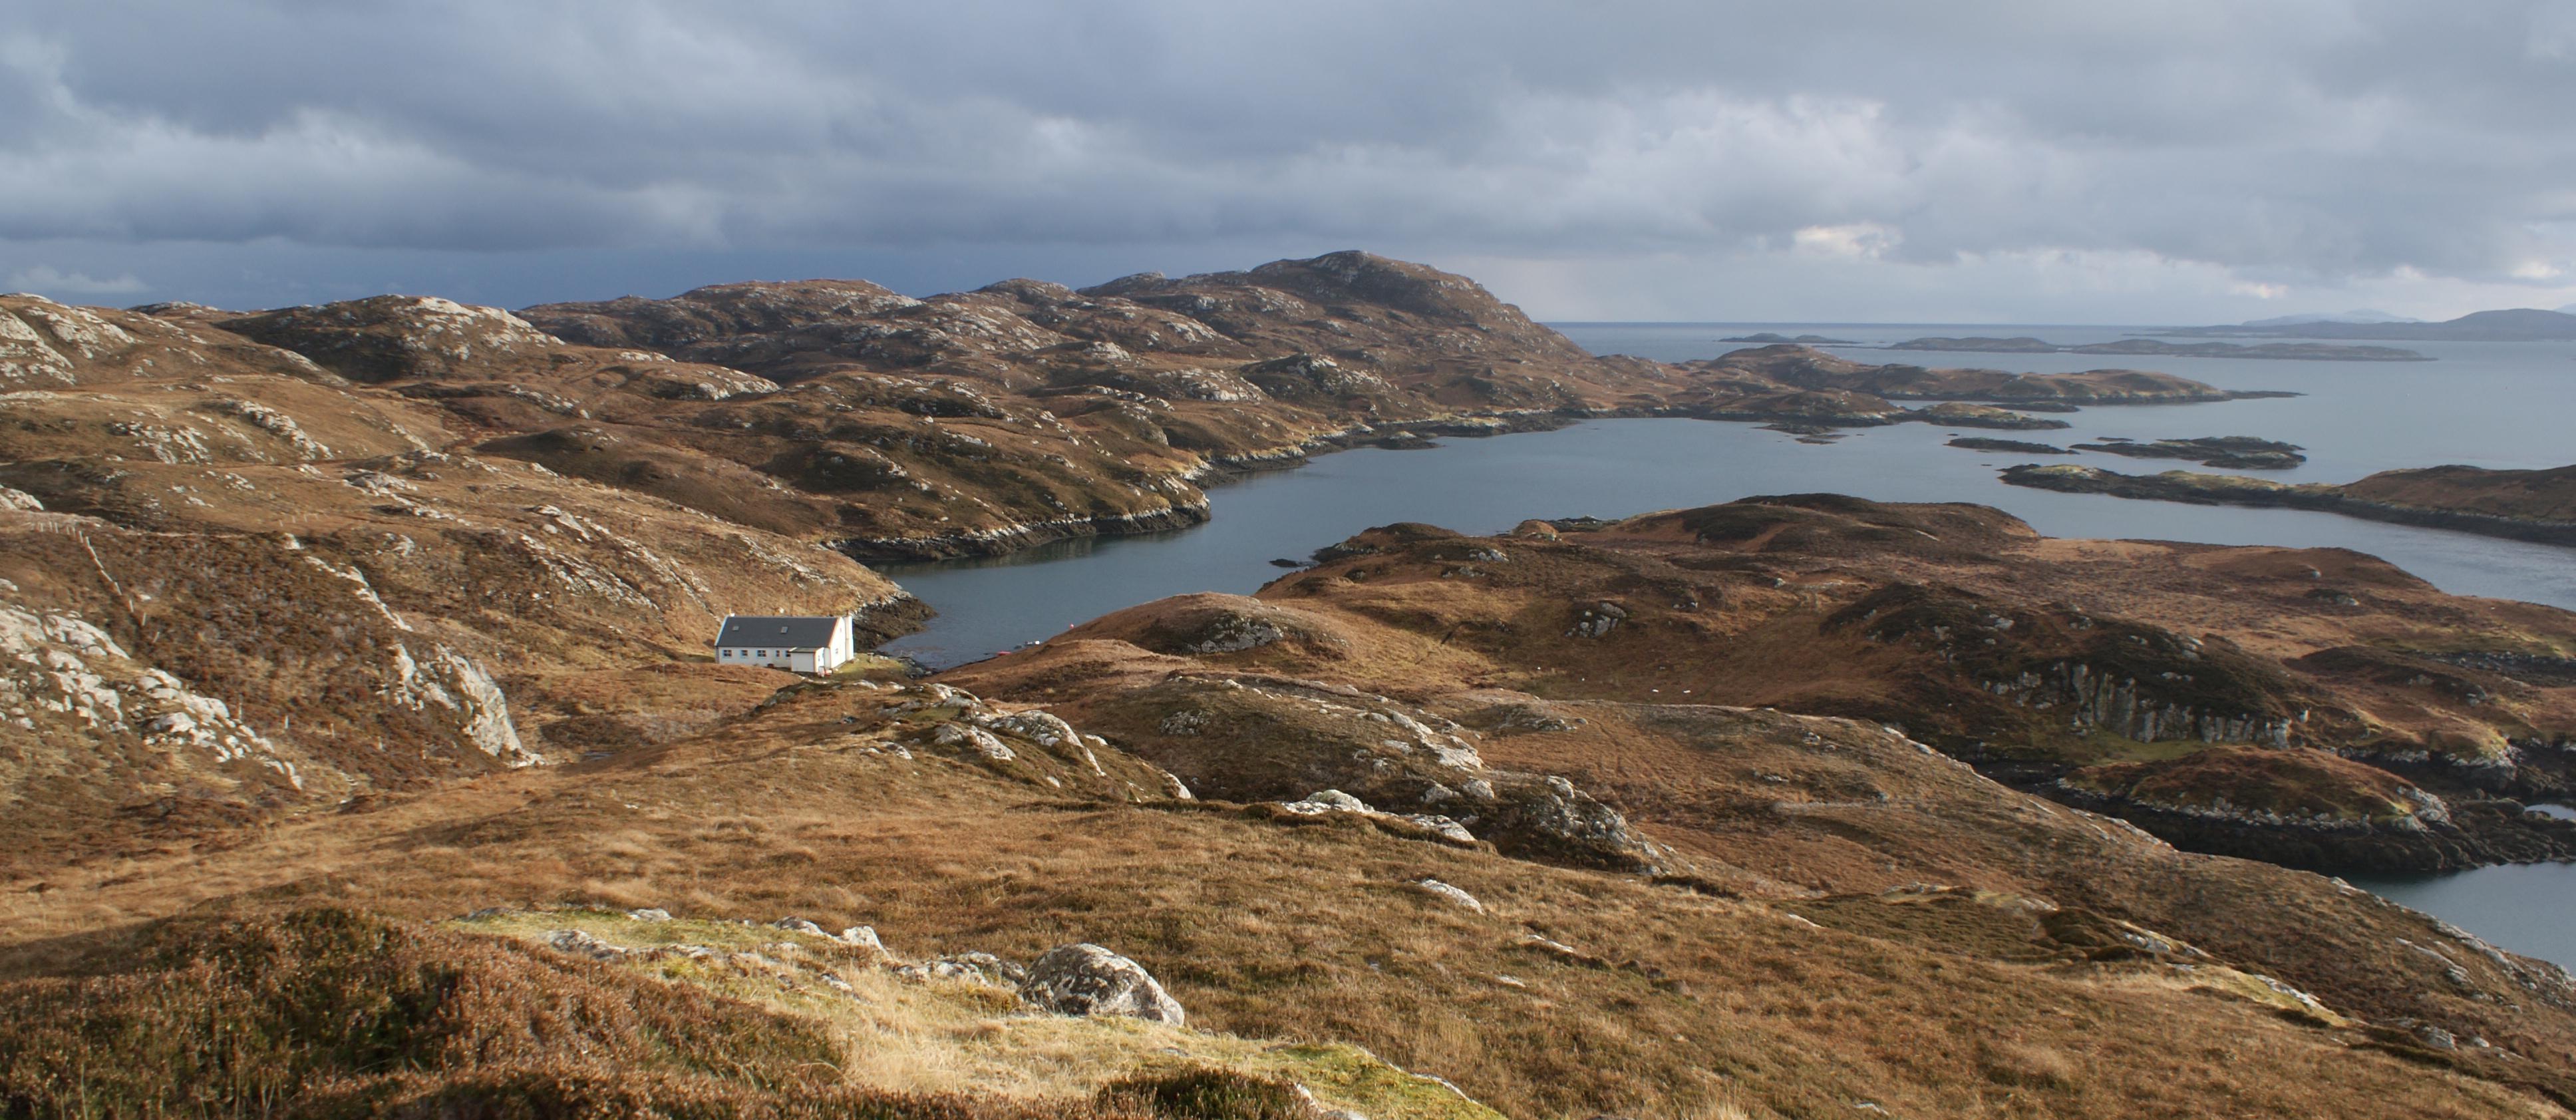 Private island for rent in Scotland